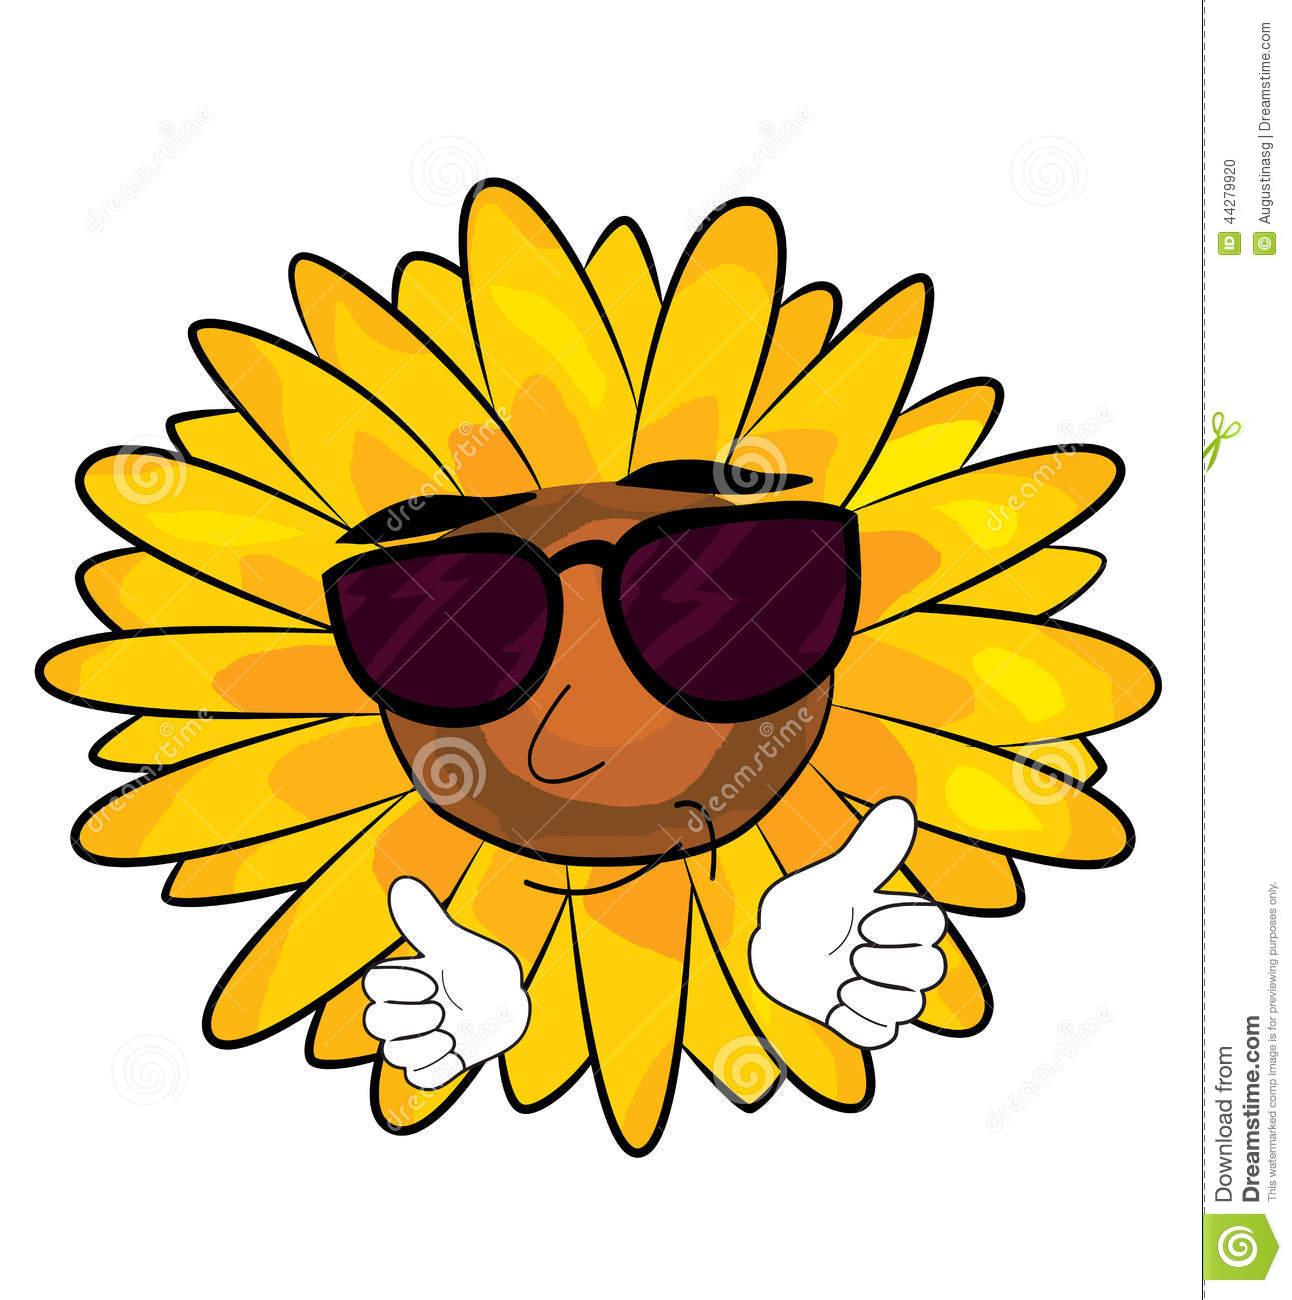 1292x1300 Sunflower Cartoon Drawing Cartoon Sunflower Stock Image